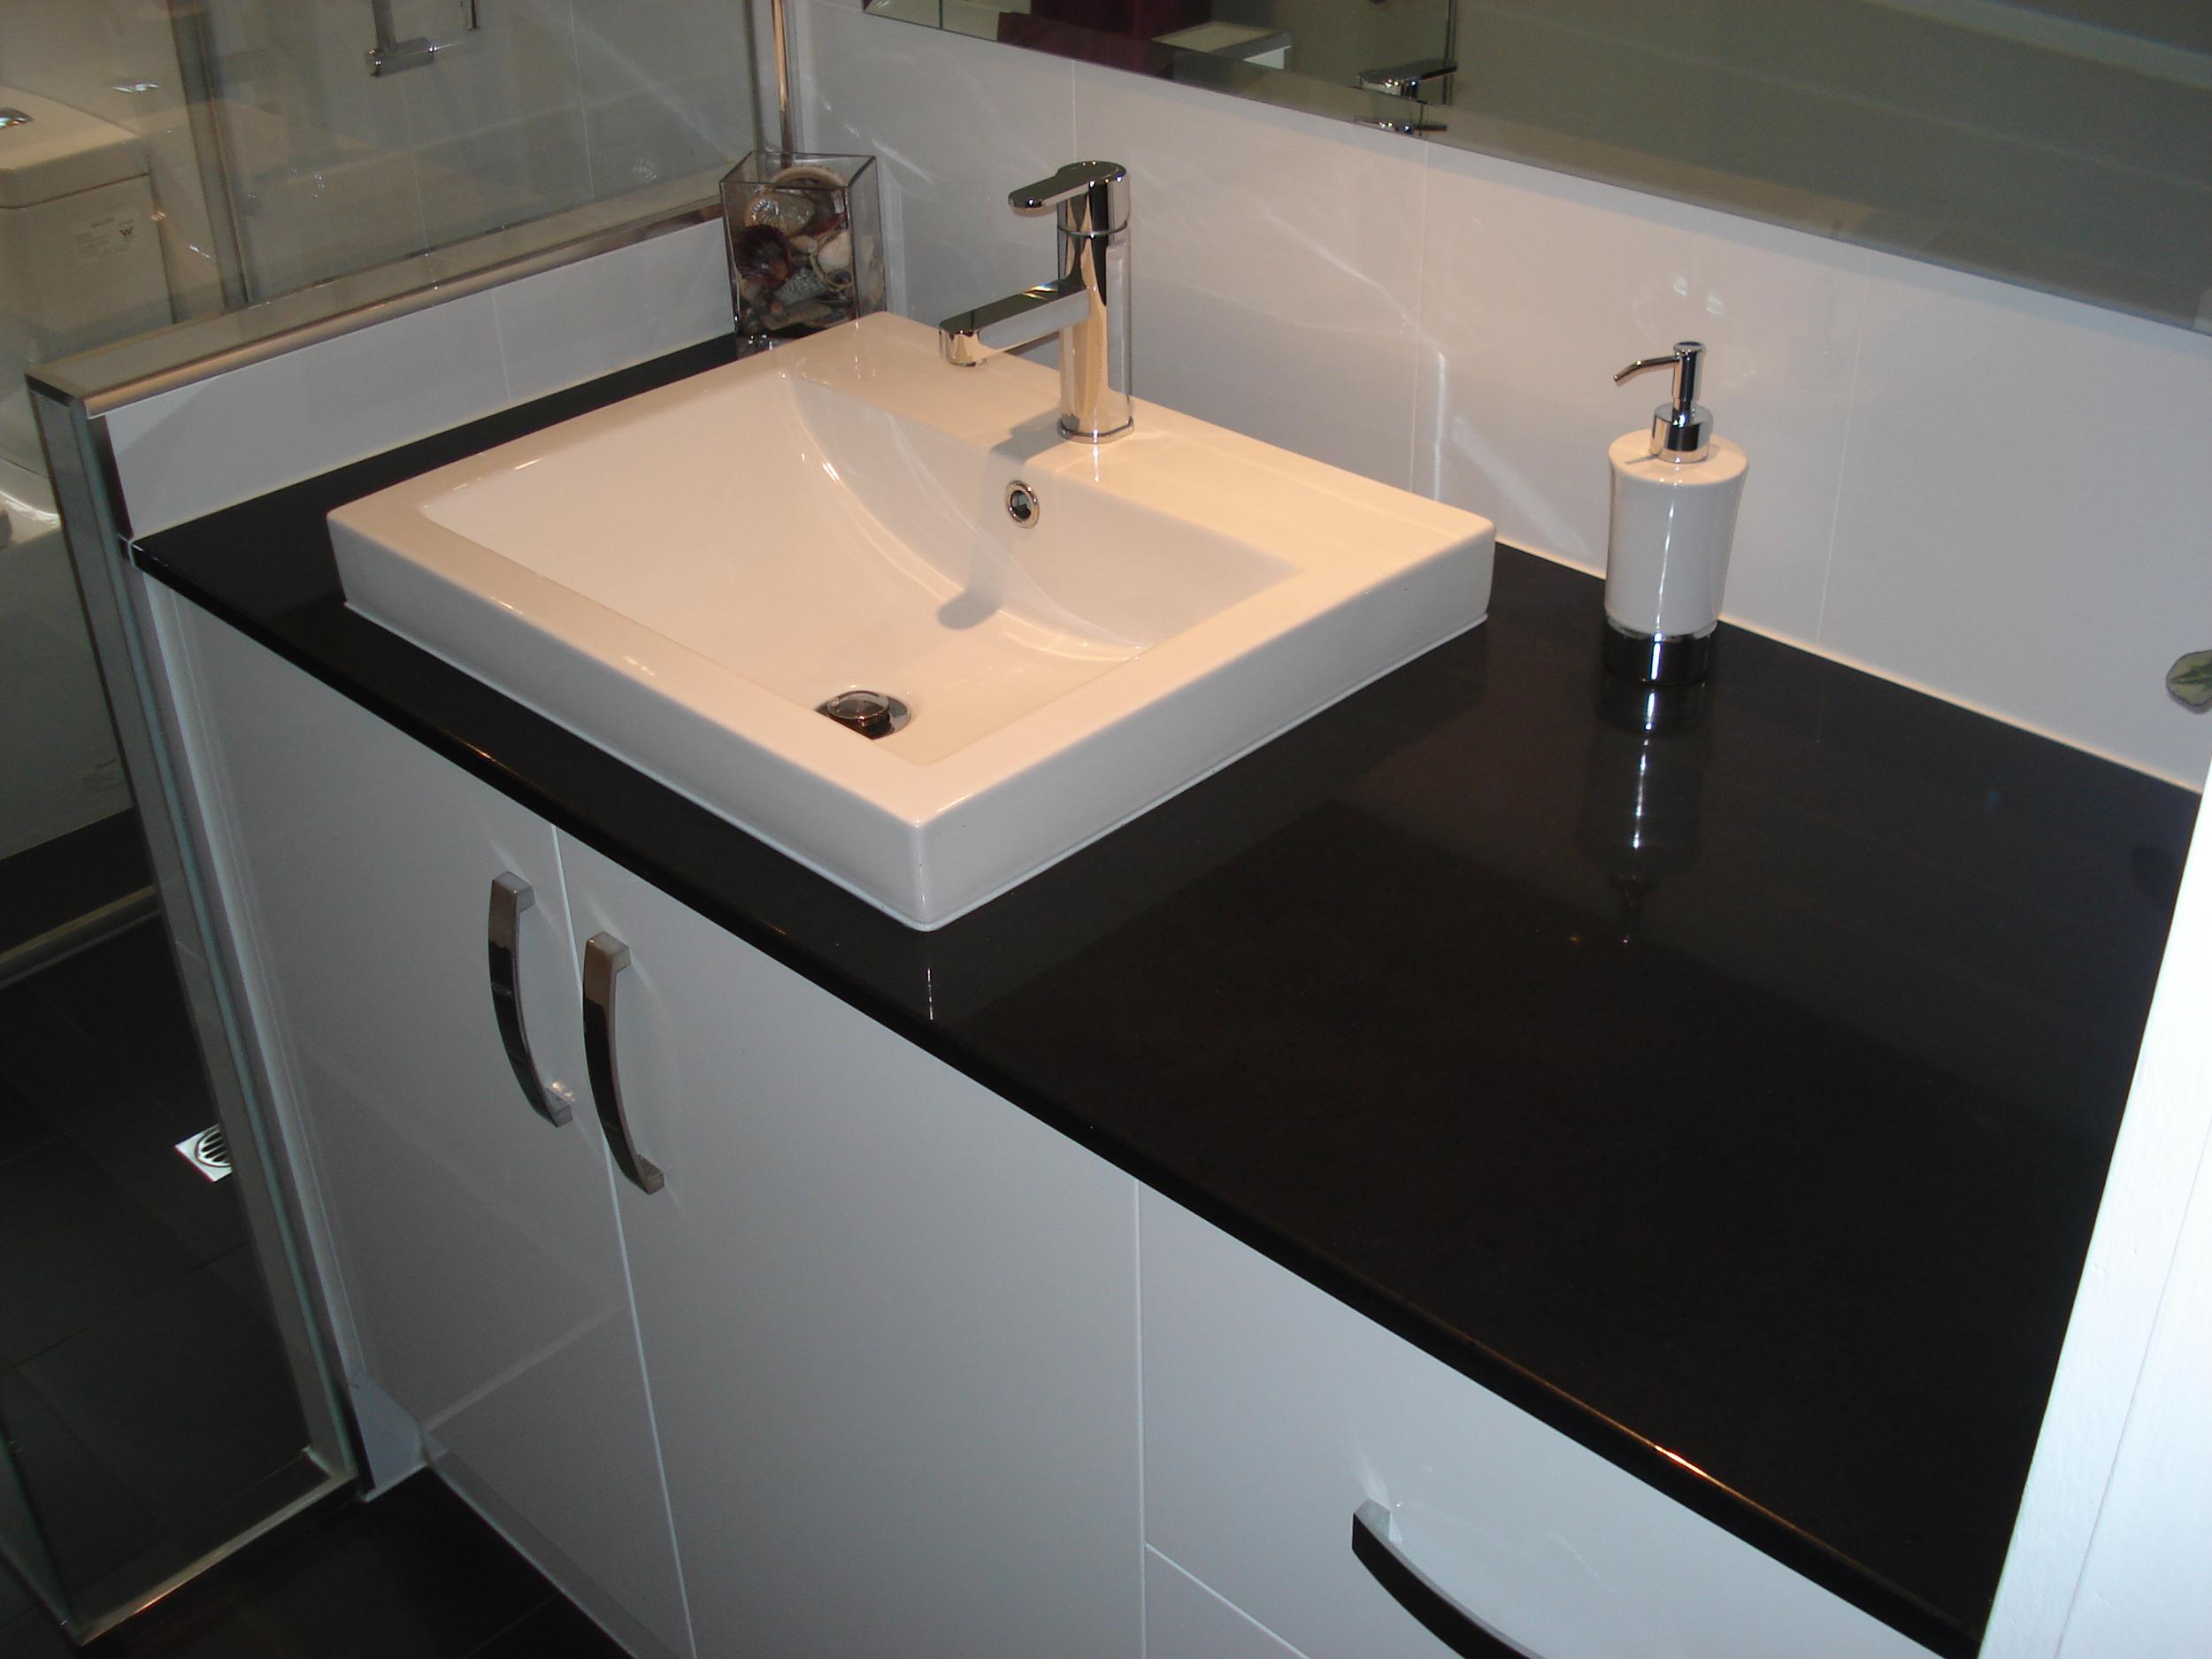 Radic-Plumbing-Cabinets-01.JPG